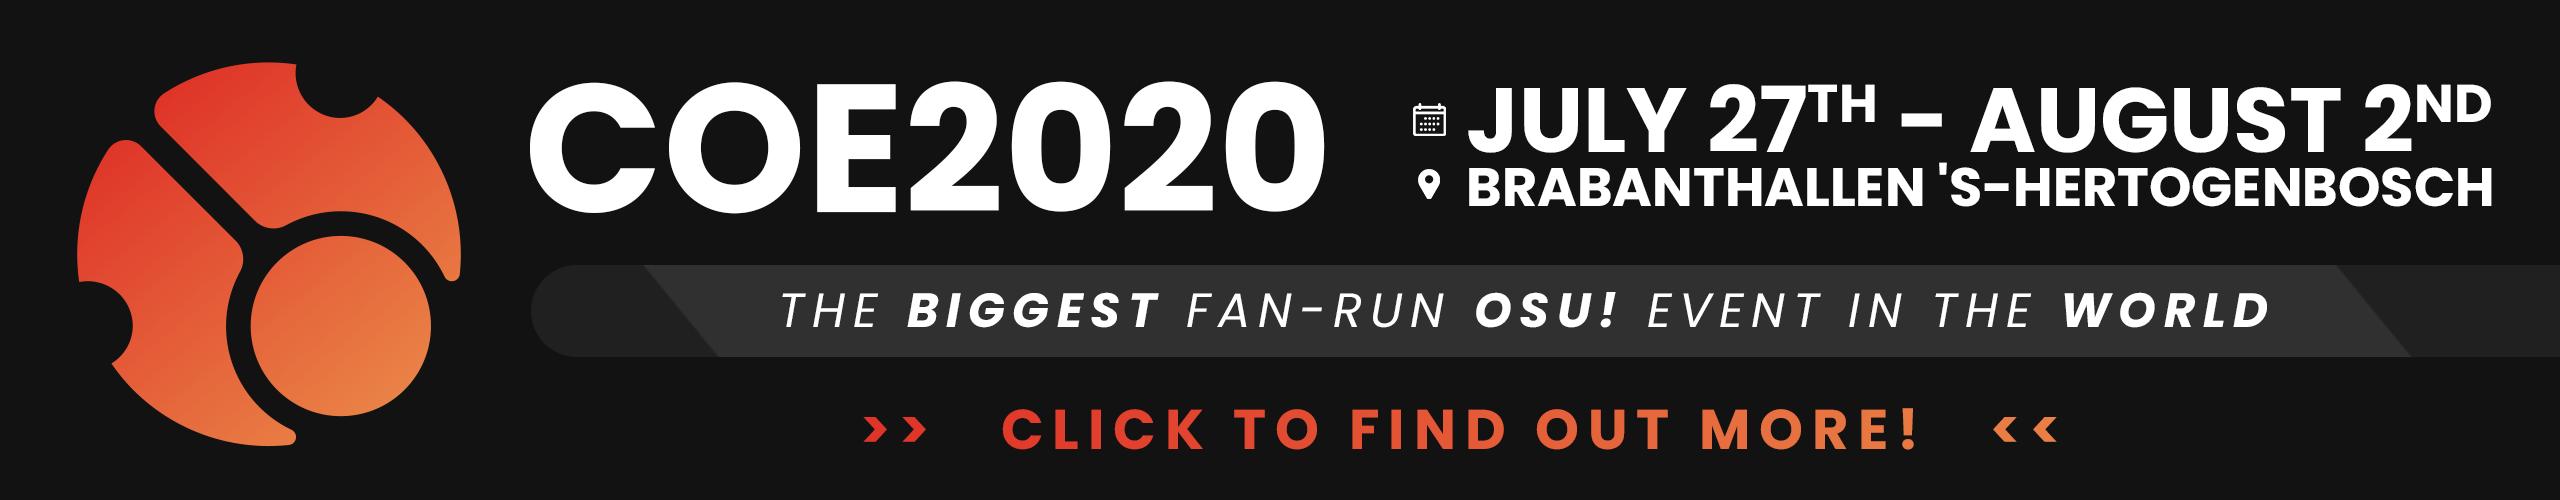 COE2020 Banner